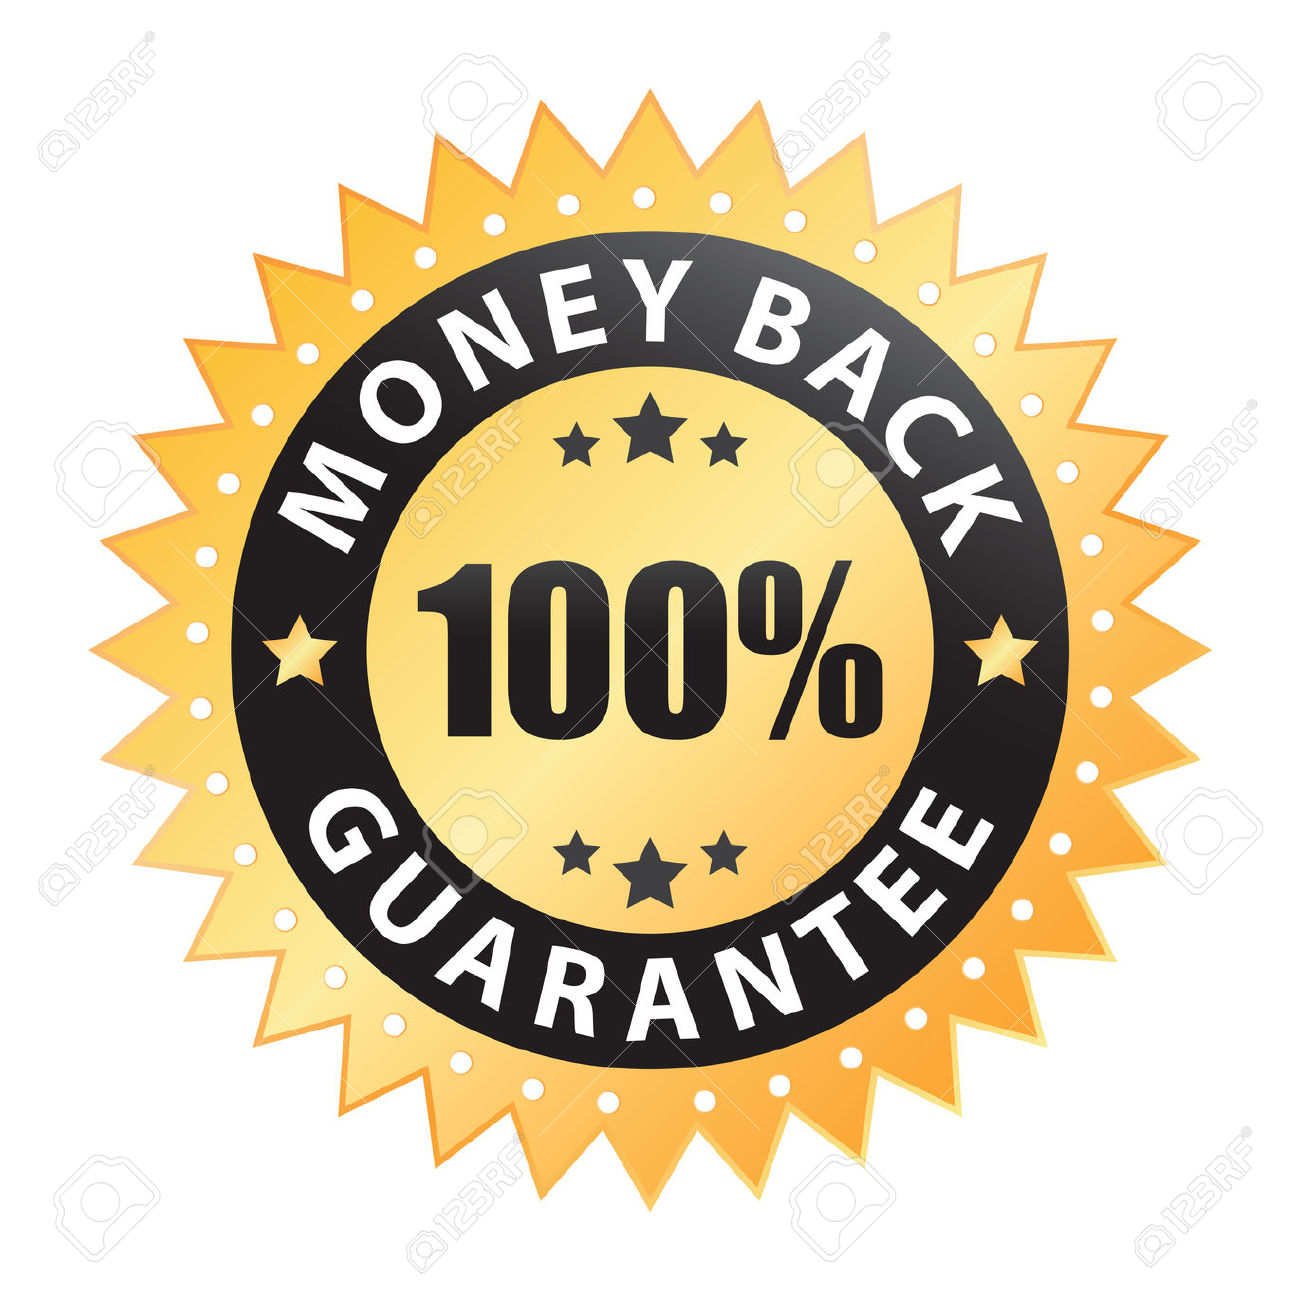 6168626-100-money-back-guarantee-label-Stock-Vector.jpg